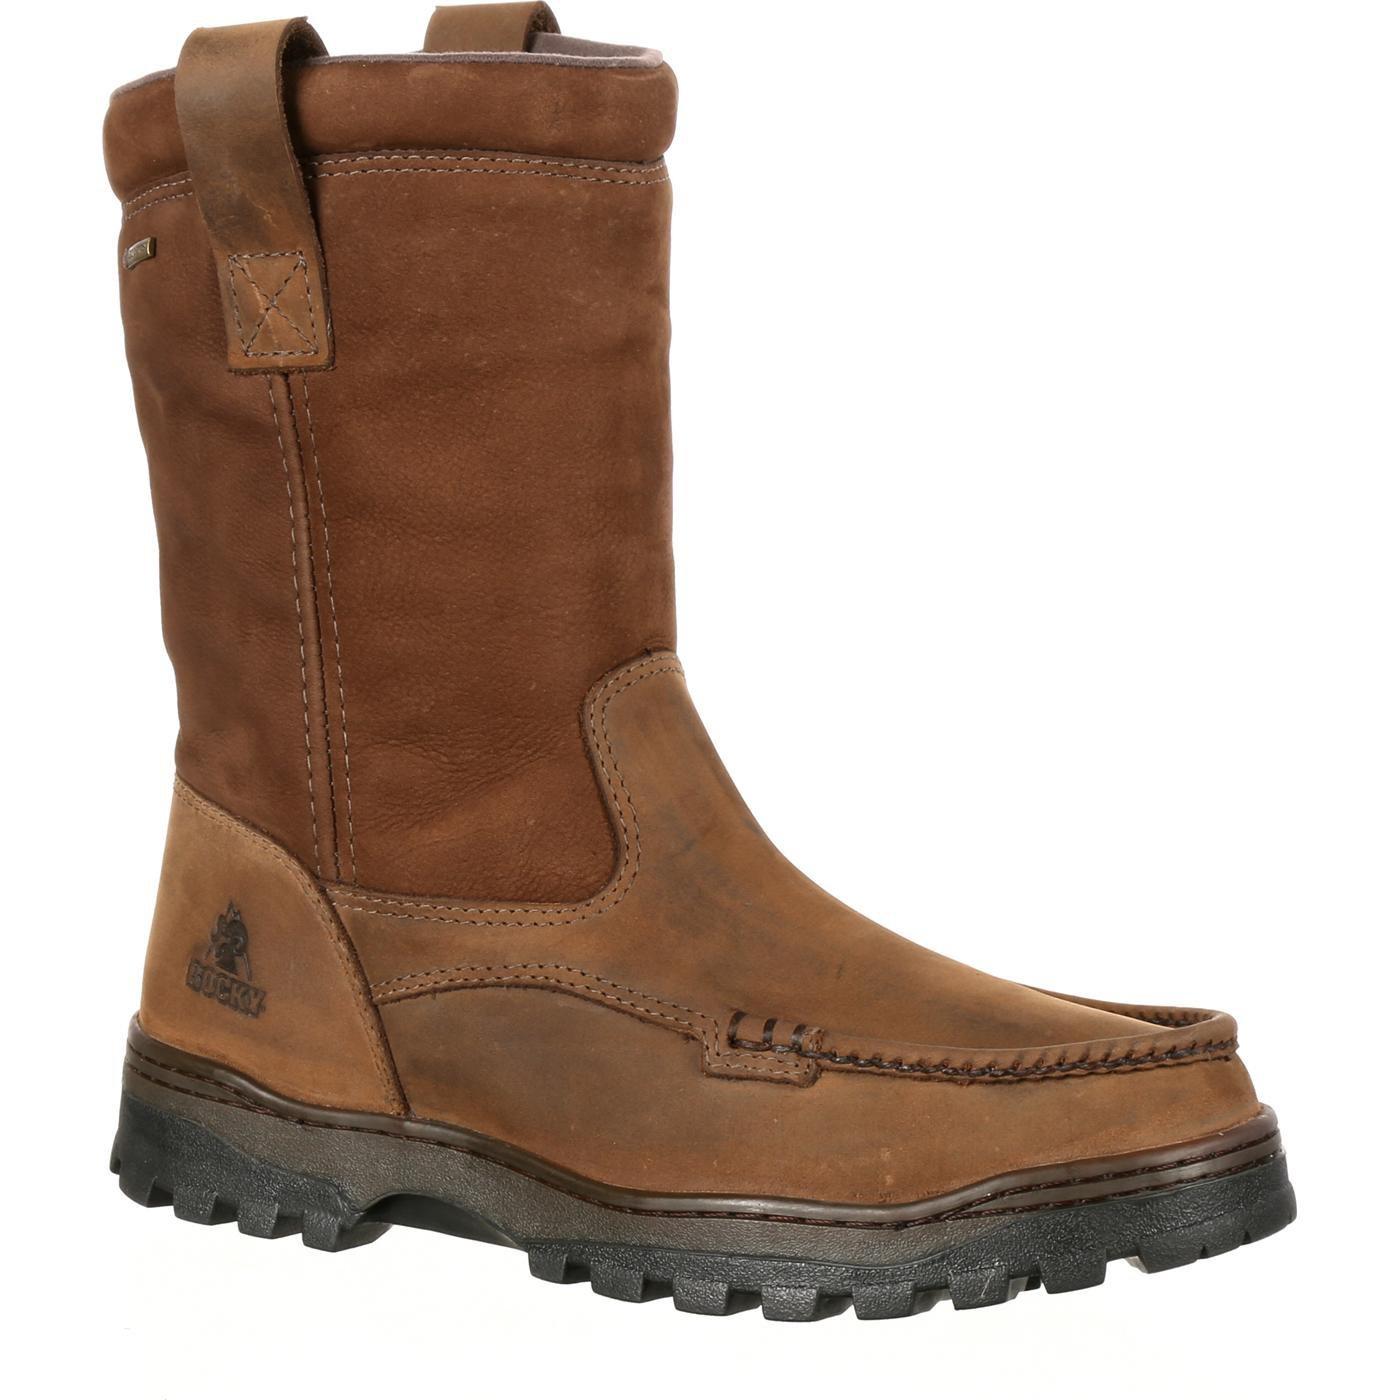 Rocky Men's Outback Waterproof Work Boot Moc Toe Brown 14 EE